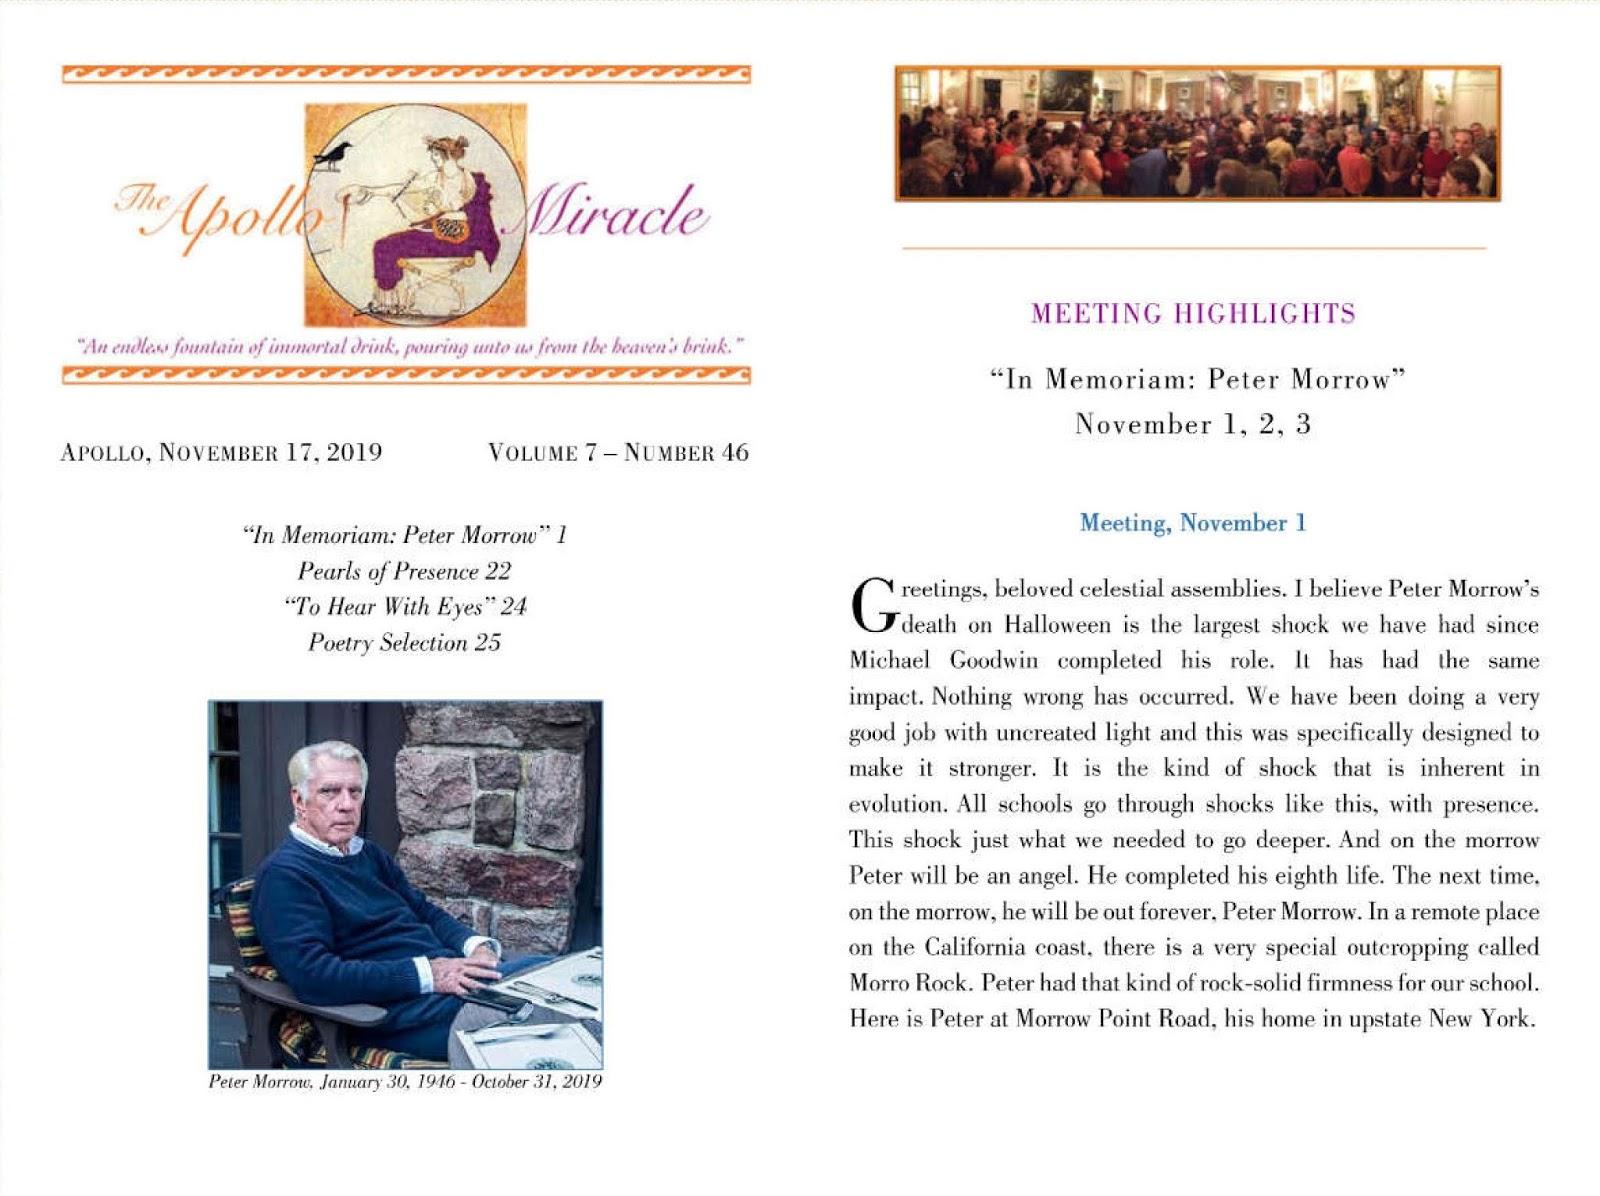 Robert Earl Burton Fellowship of Friends Apollo Miracle Newsletter regarding Peter Morrow's death